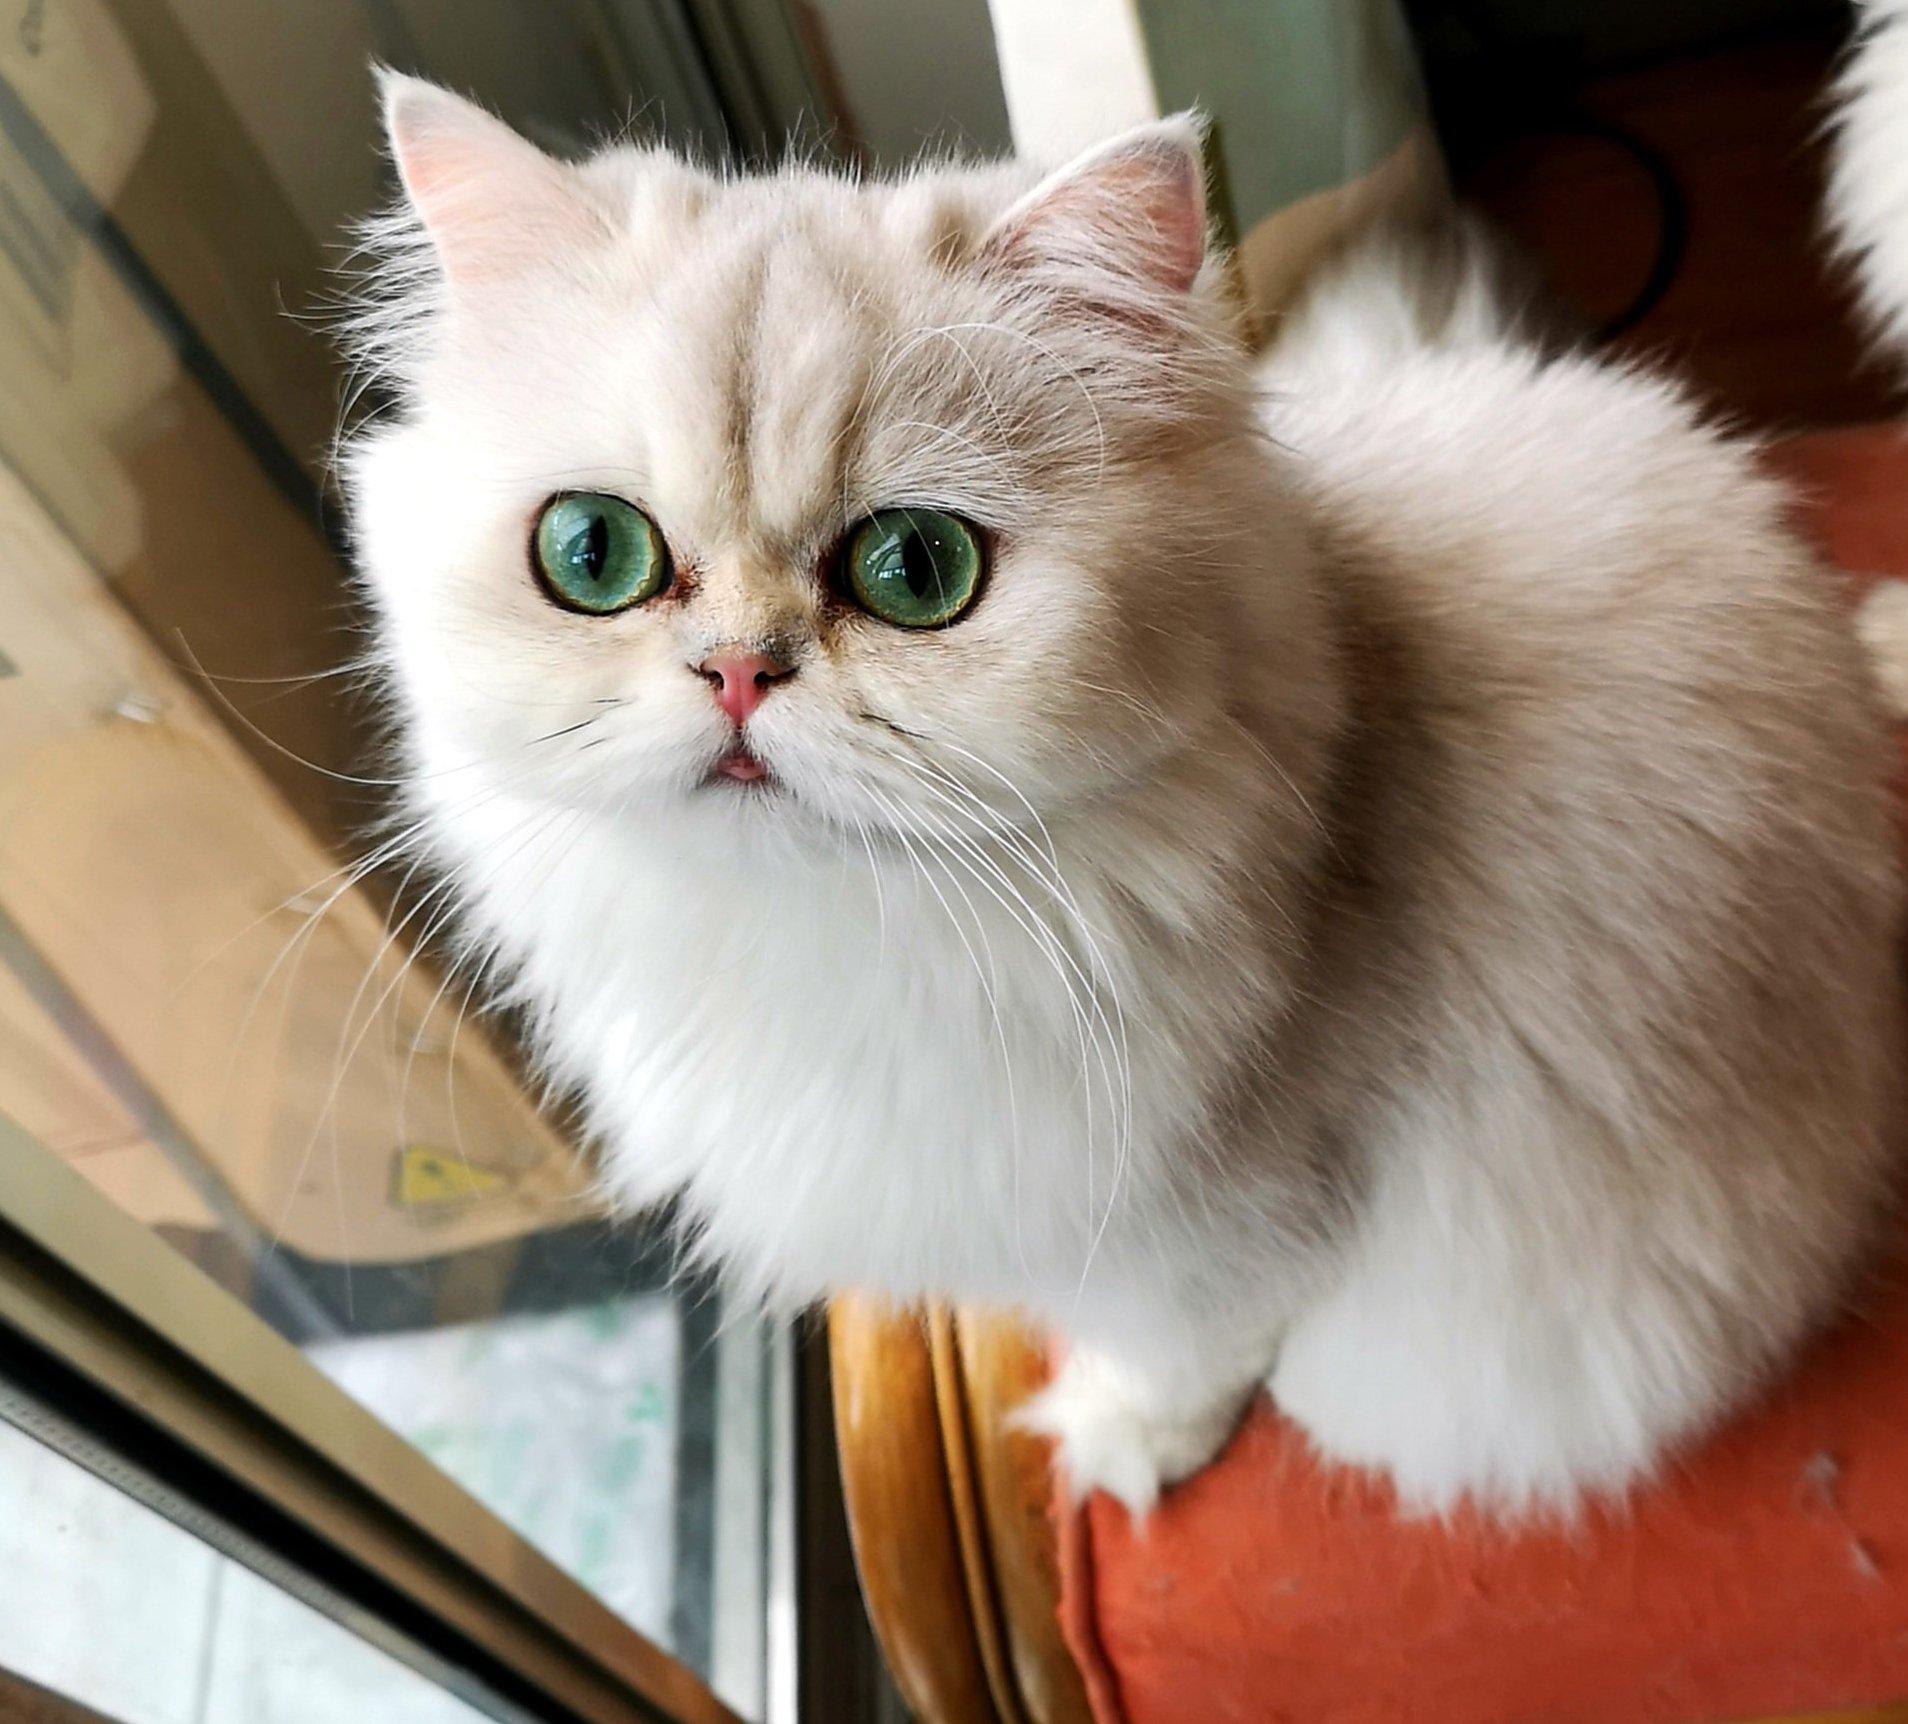 Fiatal csincsilla persza cica